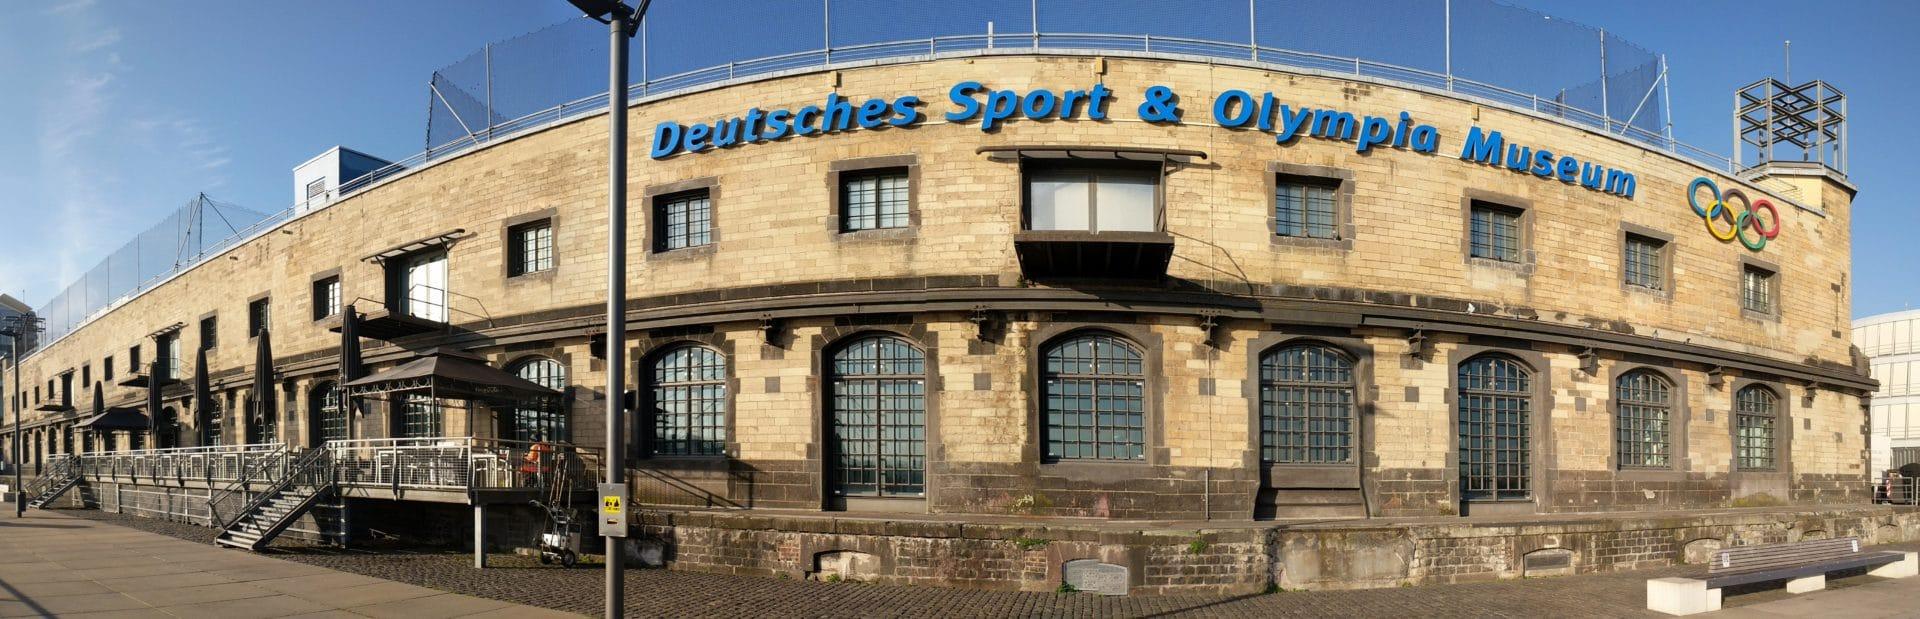 Deutsches Sport & Olympia Museum Köln